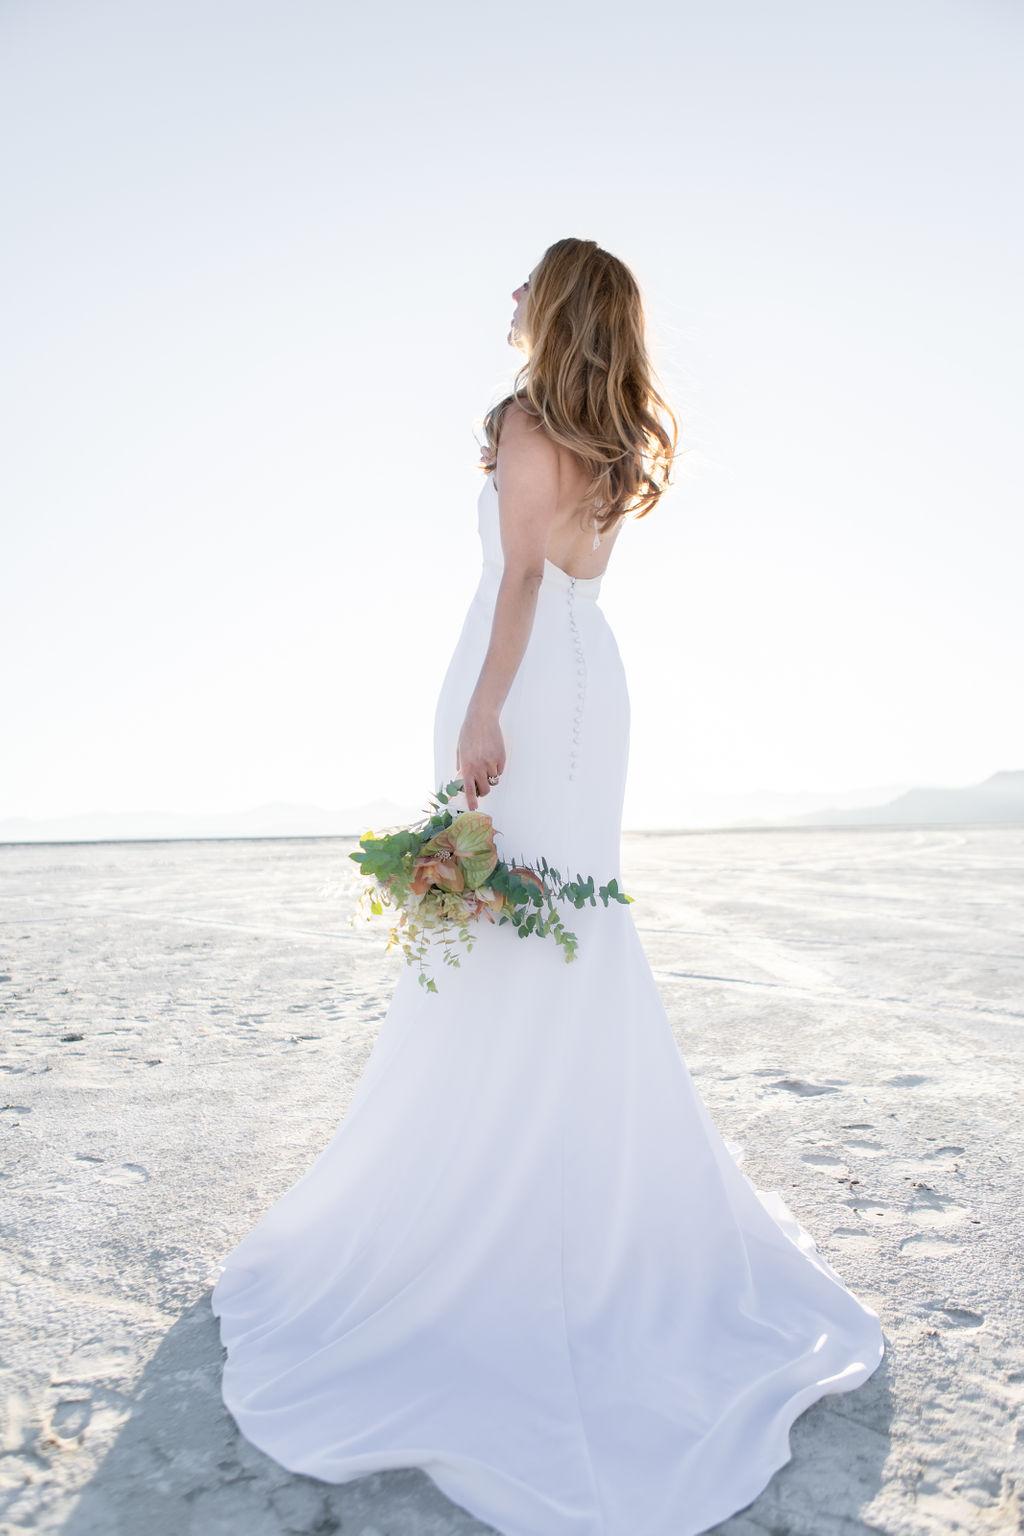 Simple Elegant Modern Goli June Brighton Wedding Dress Victoria Chukarov Salt Flats Utah 18